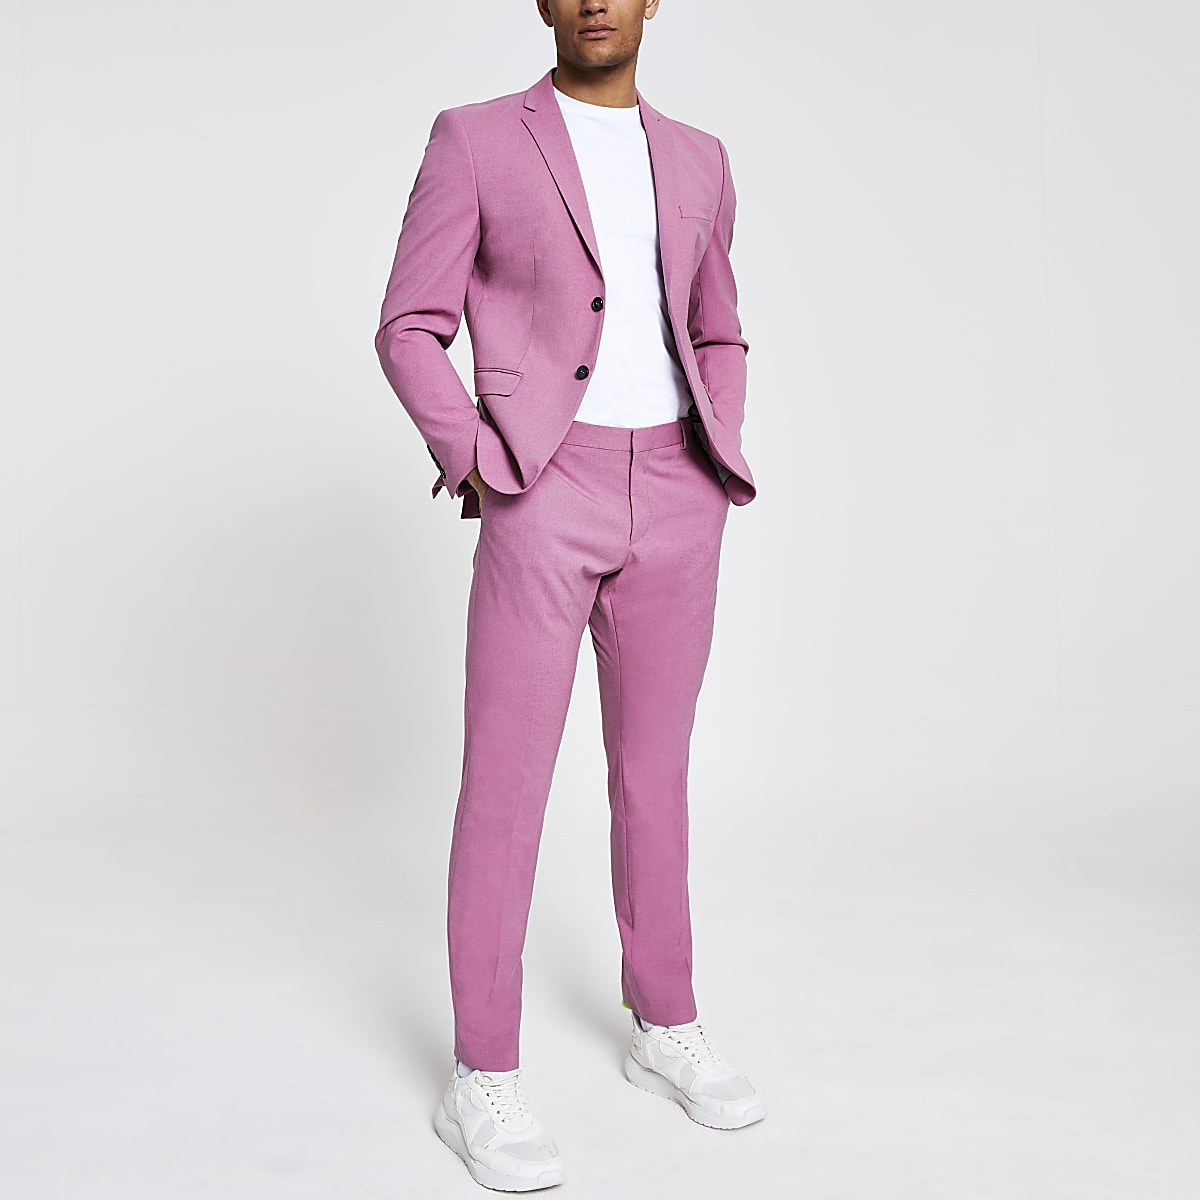 Selected Homme pink slim fit suit pants